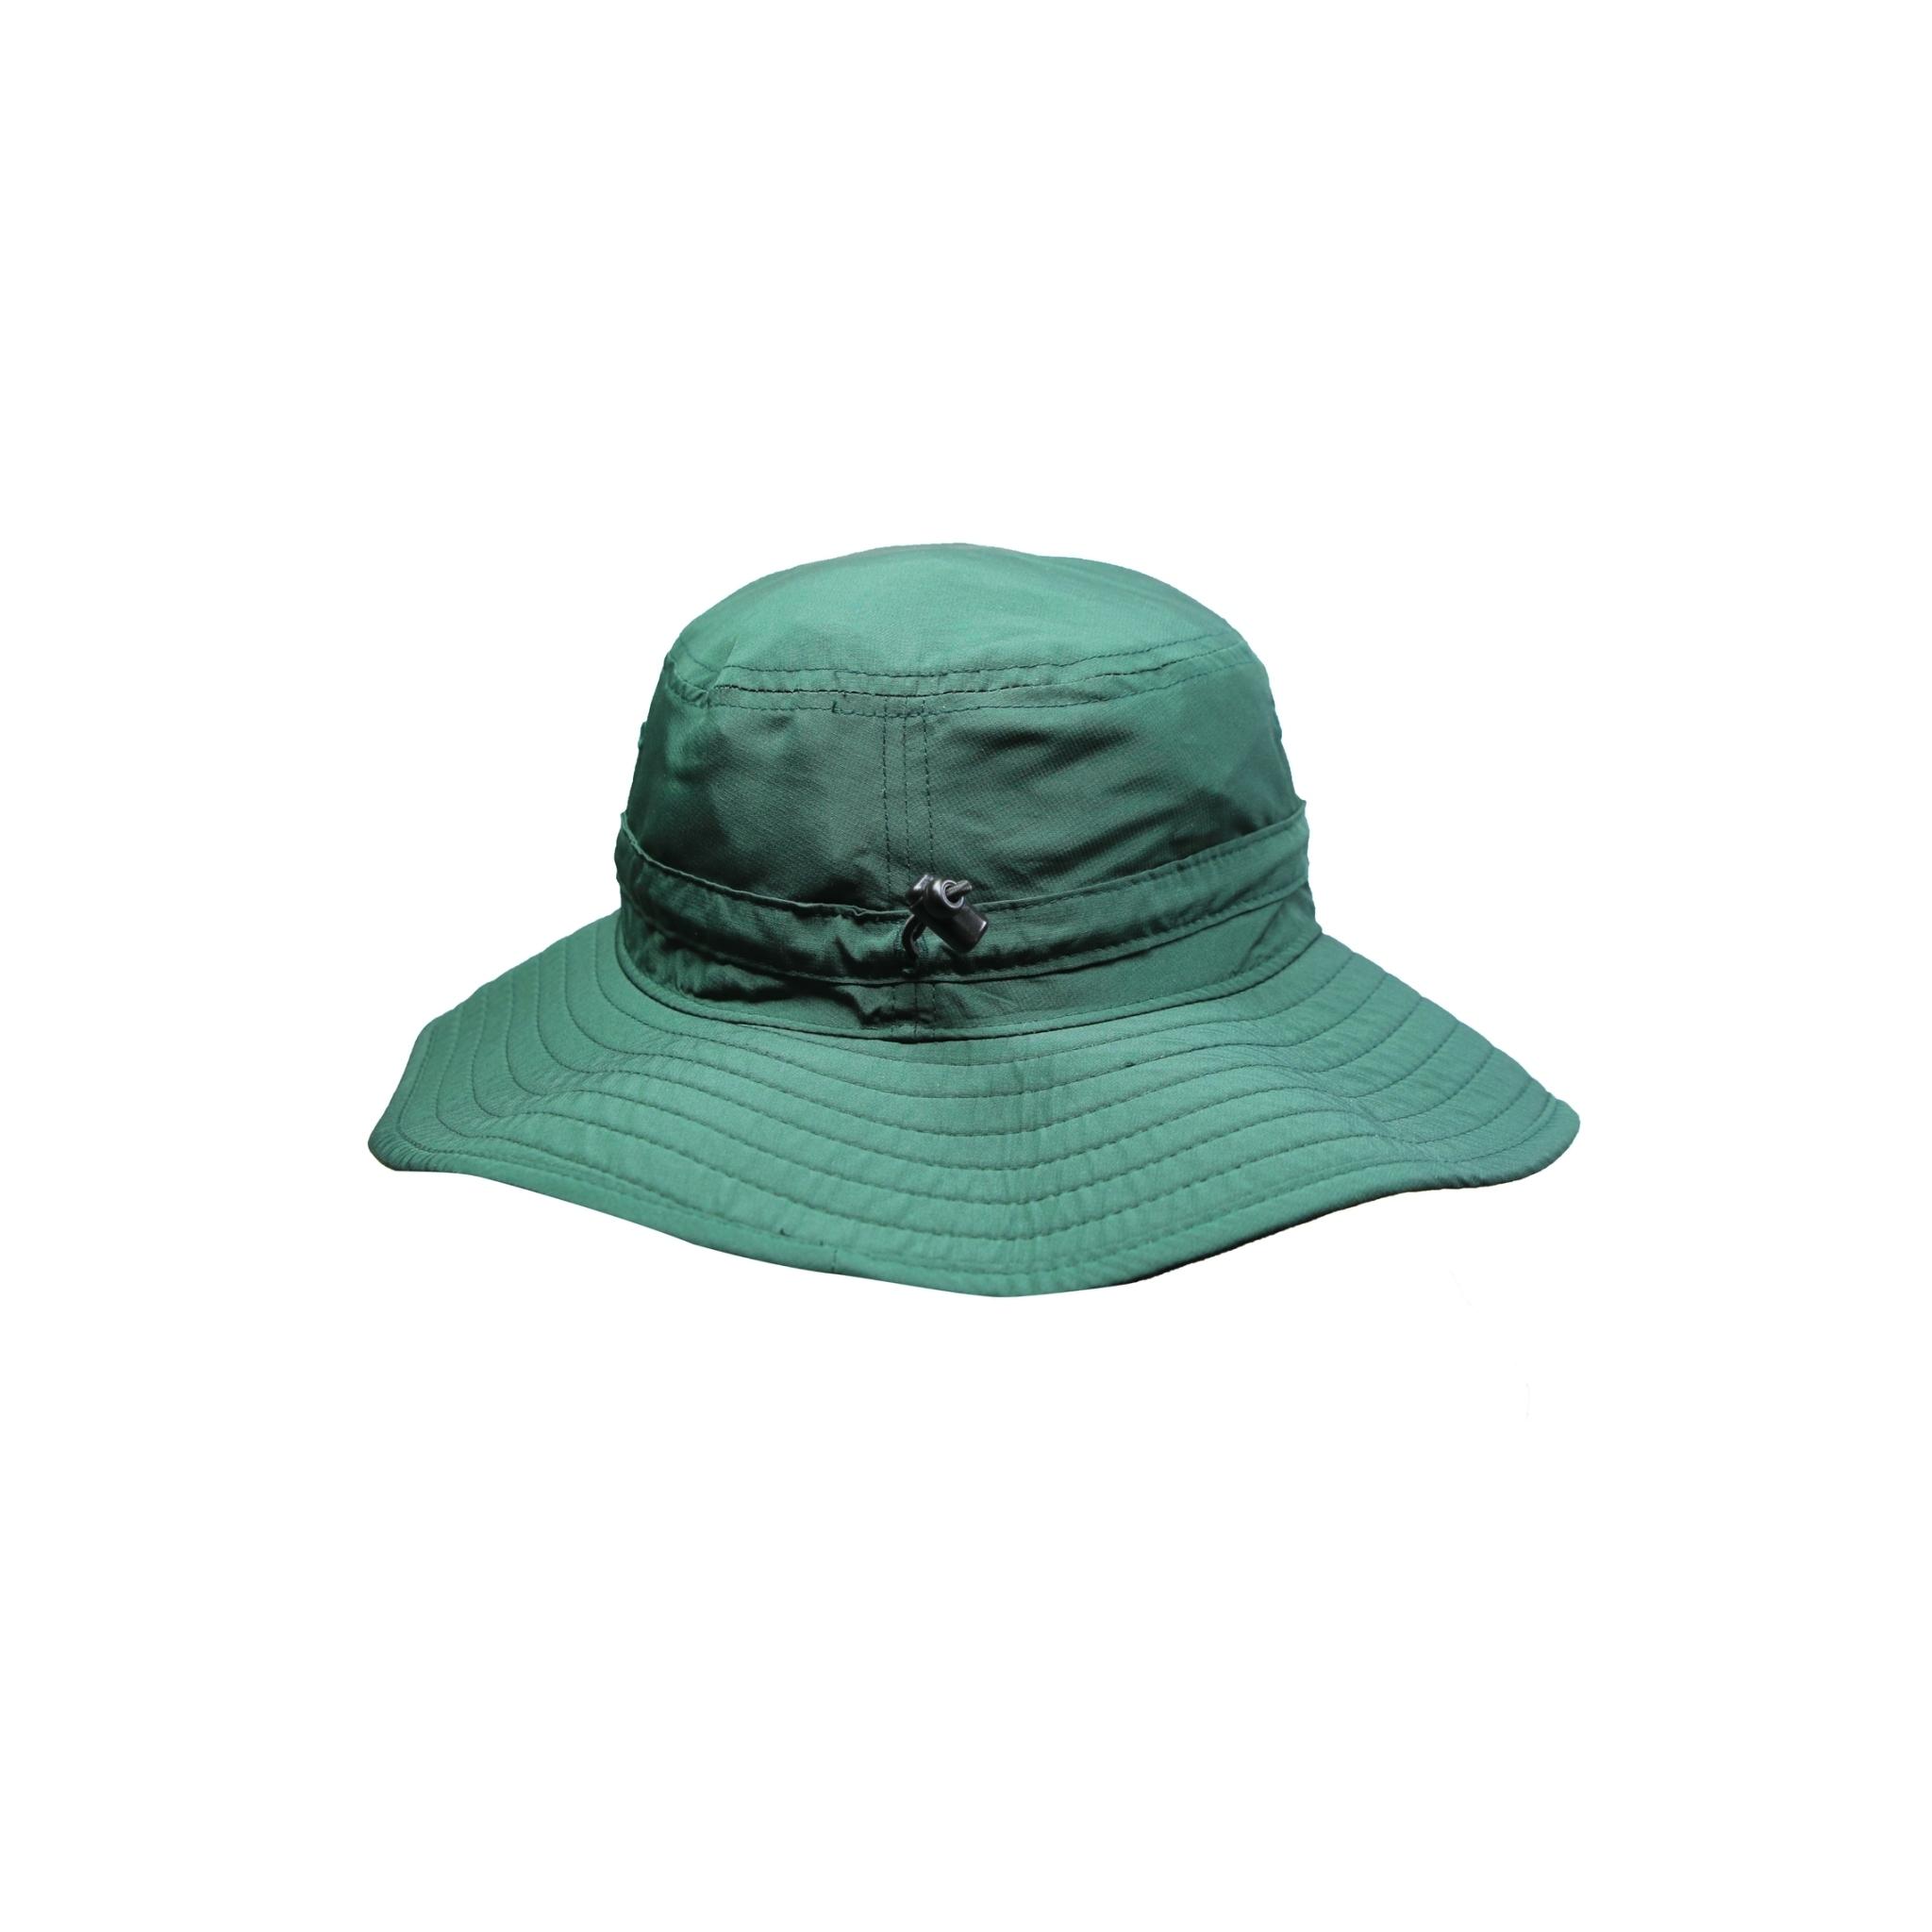 LOGO CAMP BOONEY [GREEN]